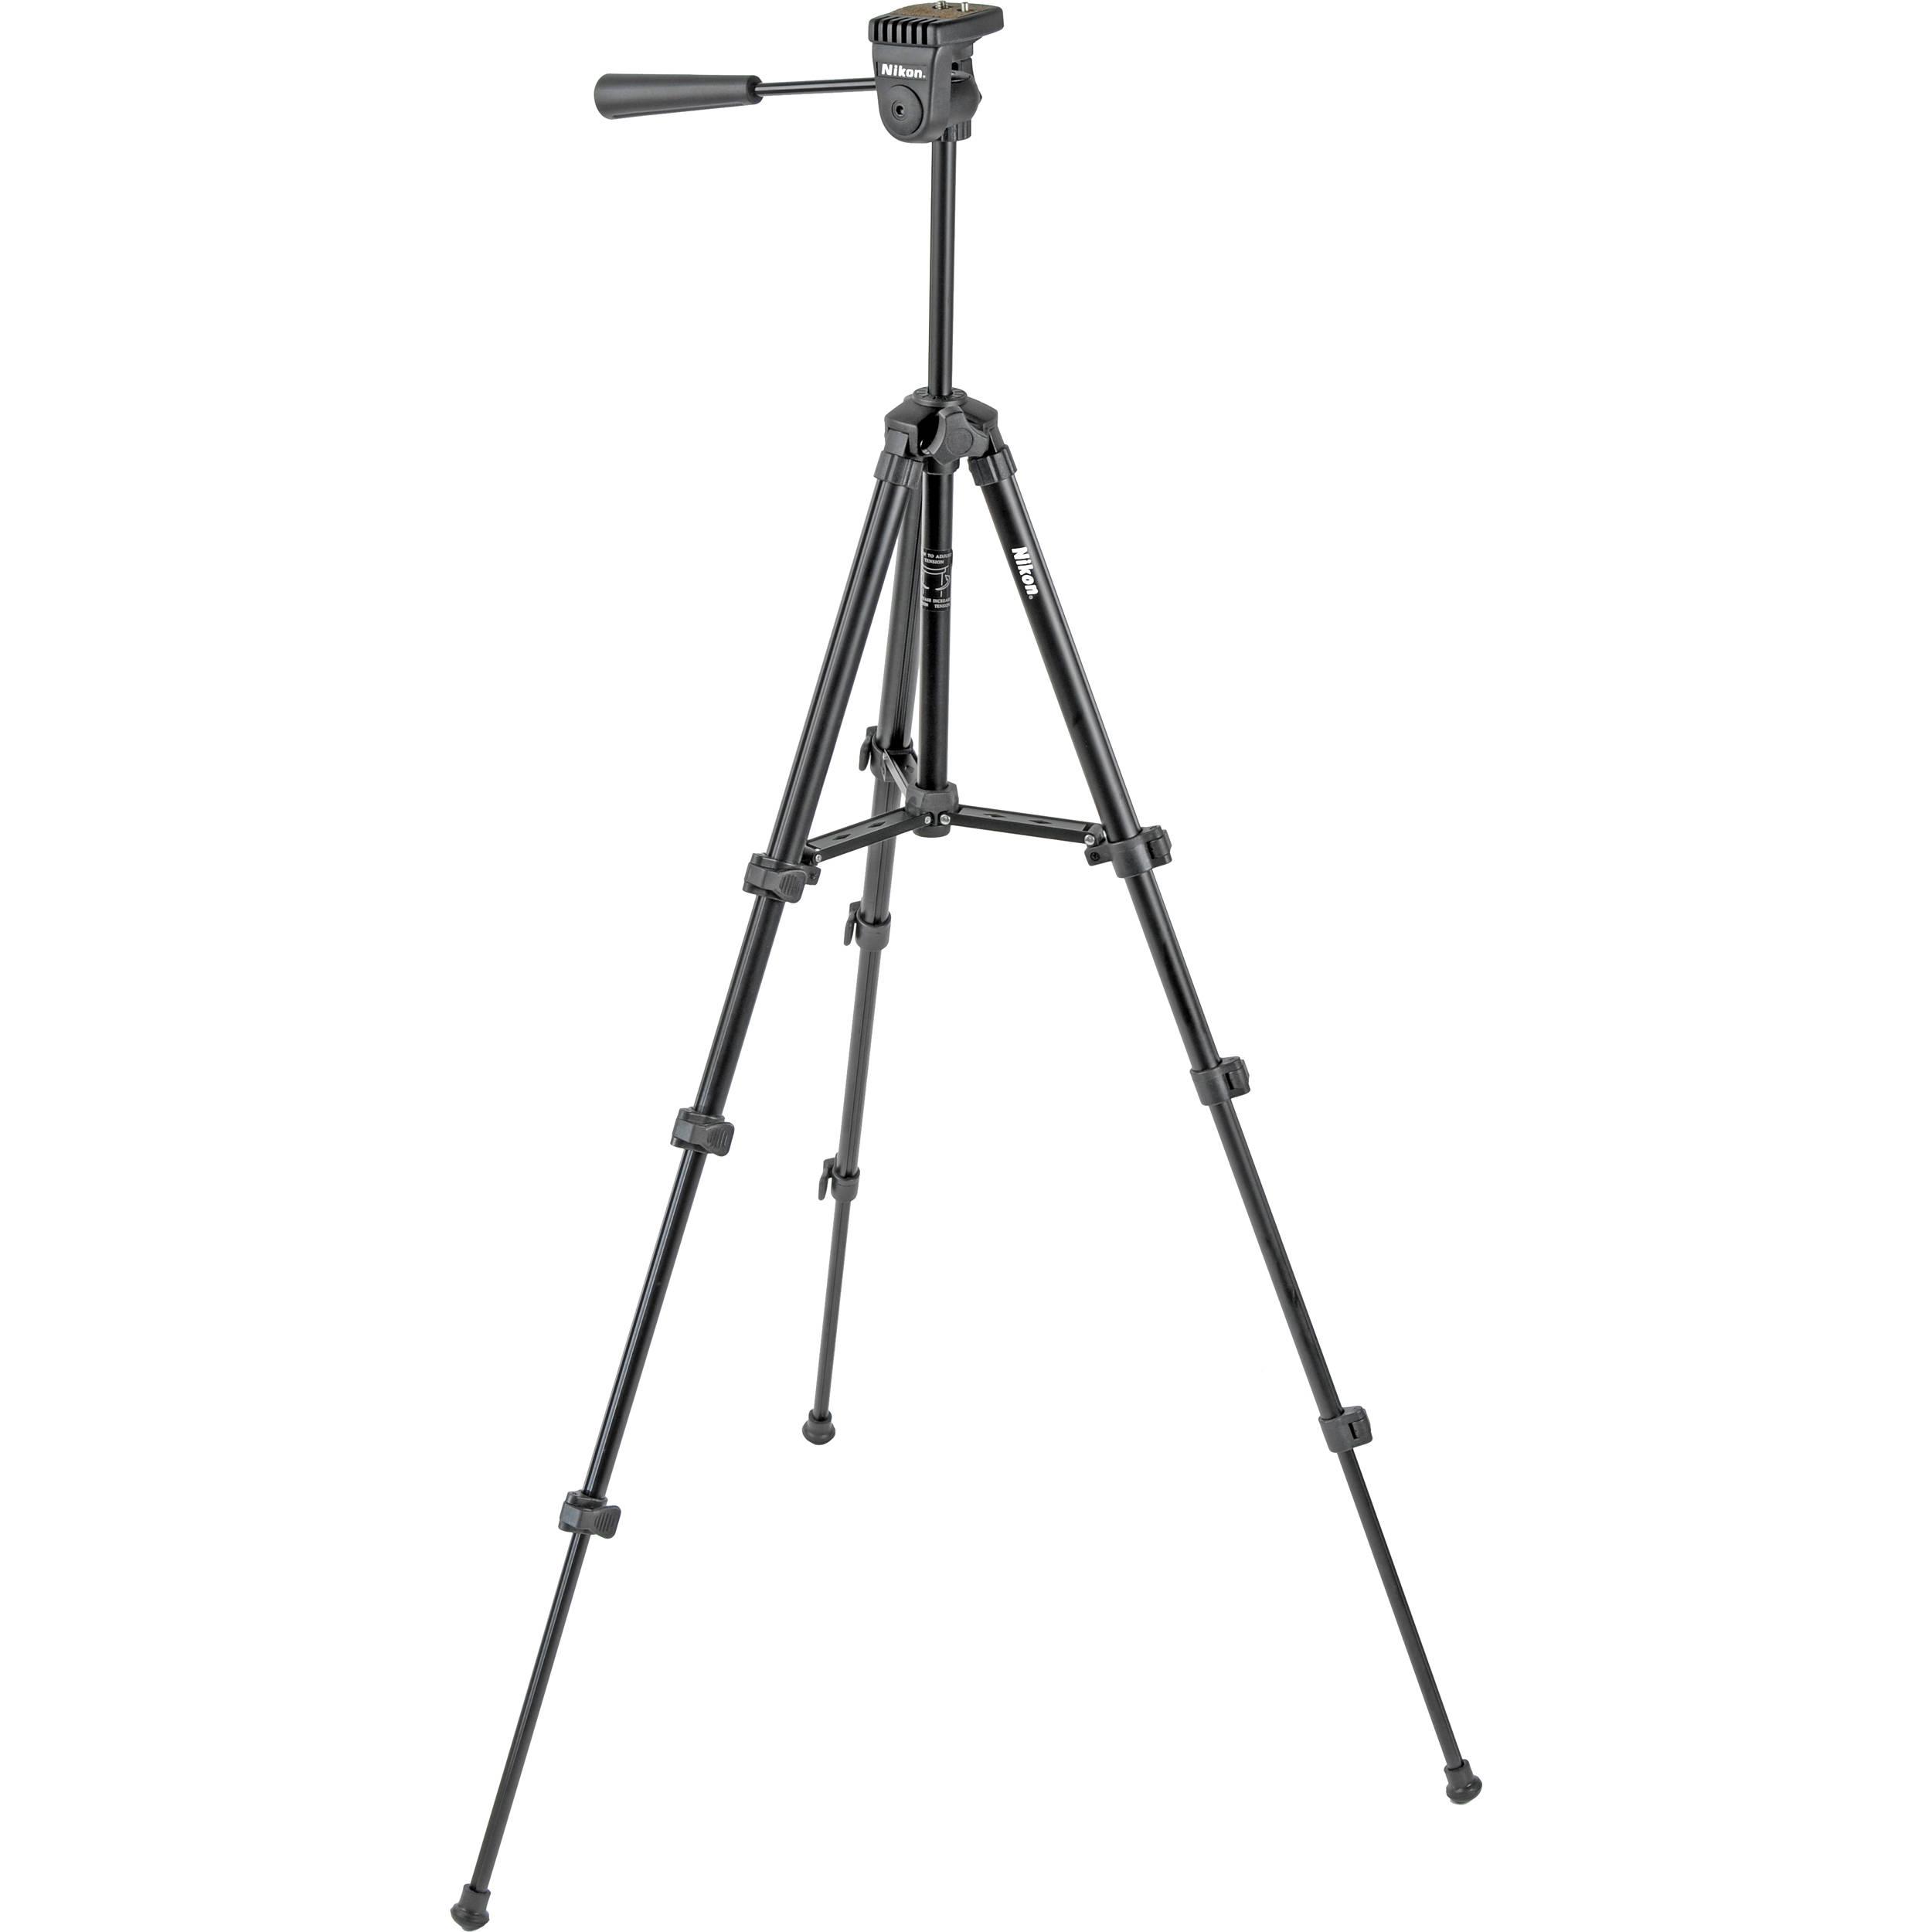 Nikon Compact Tripod with 2-Way Panhead 822 B&H Photo Video